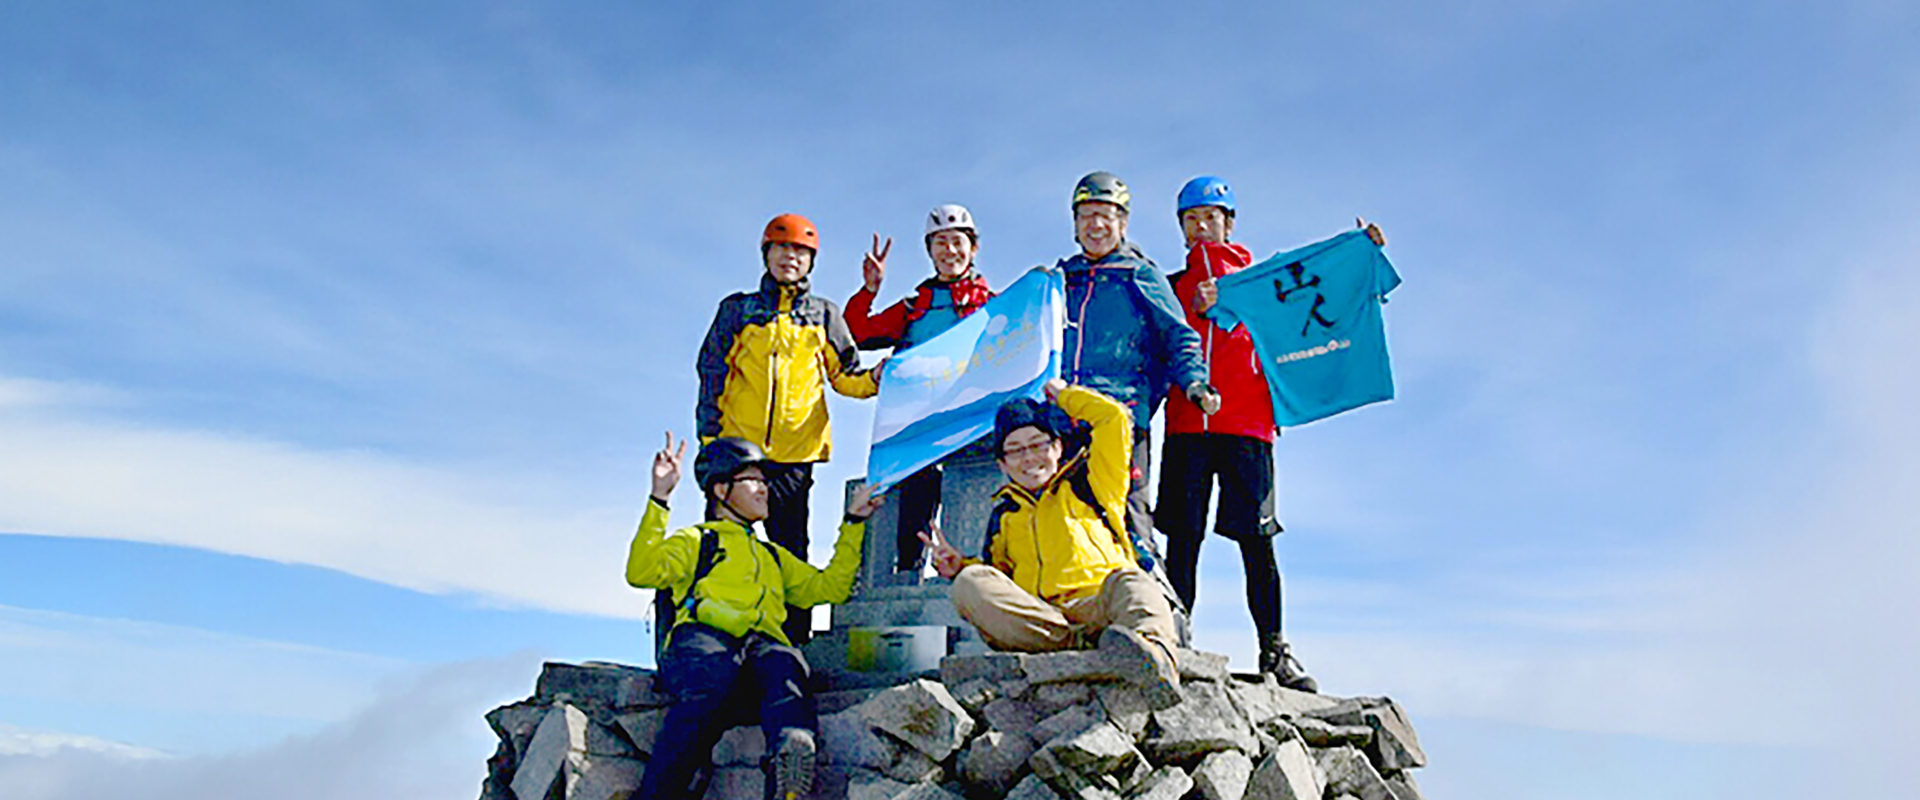 奥穂高登頂 鉃友会登山部「山を愛する会」